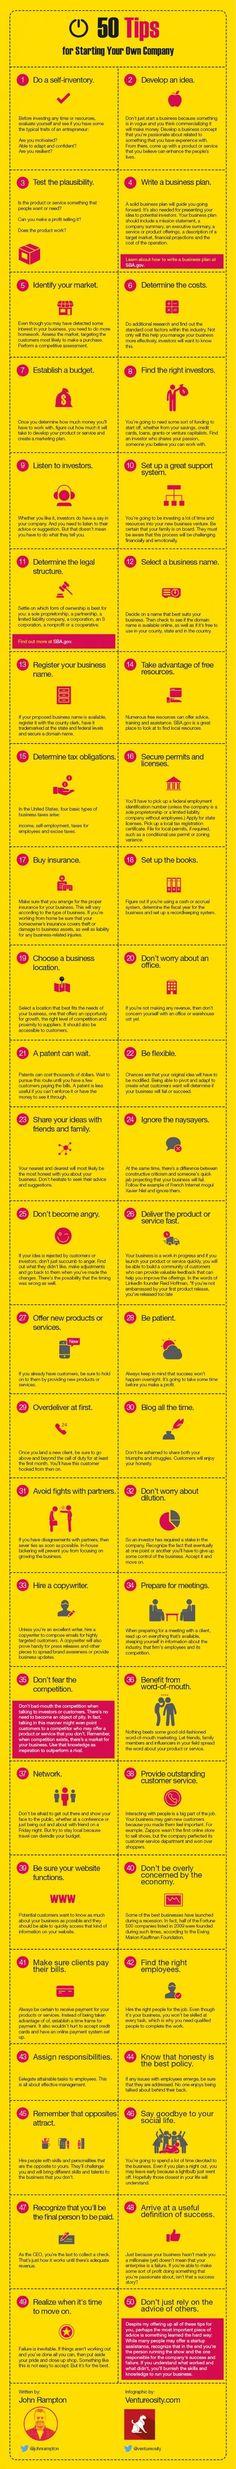 50 Things to Do When Starting a Business - #enterpreneur #startups (scheduled via http://www.tailwindapp.com?utm_source=pinterest&utm_medium=twpin&utm_content=post78410977&utm_campaign=scheduler_attribution)